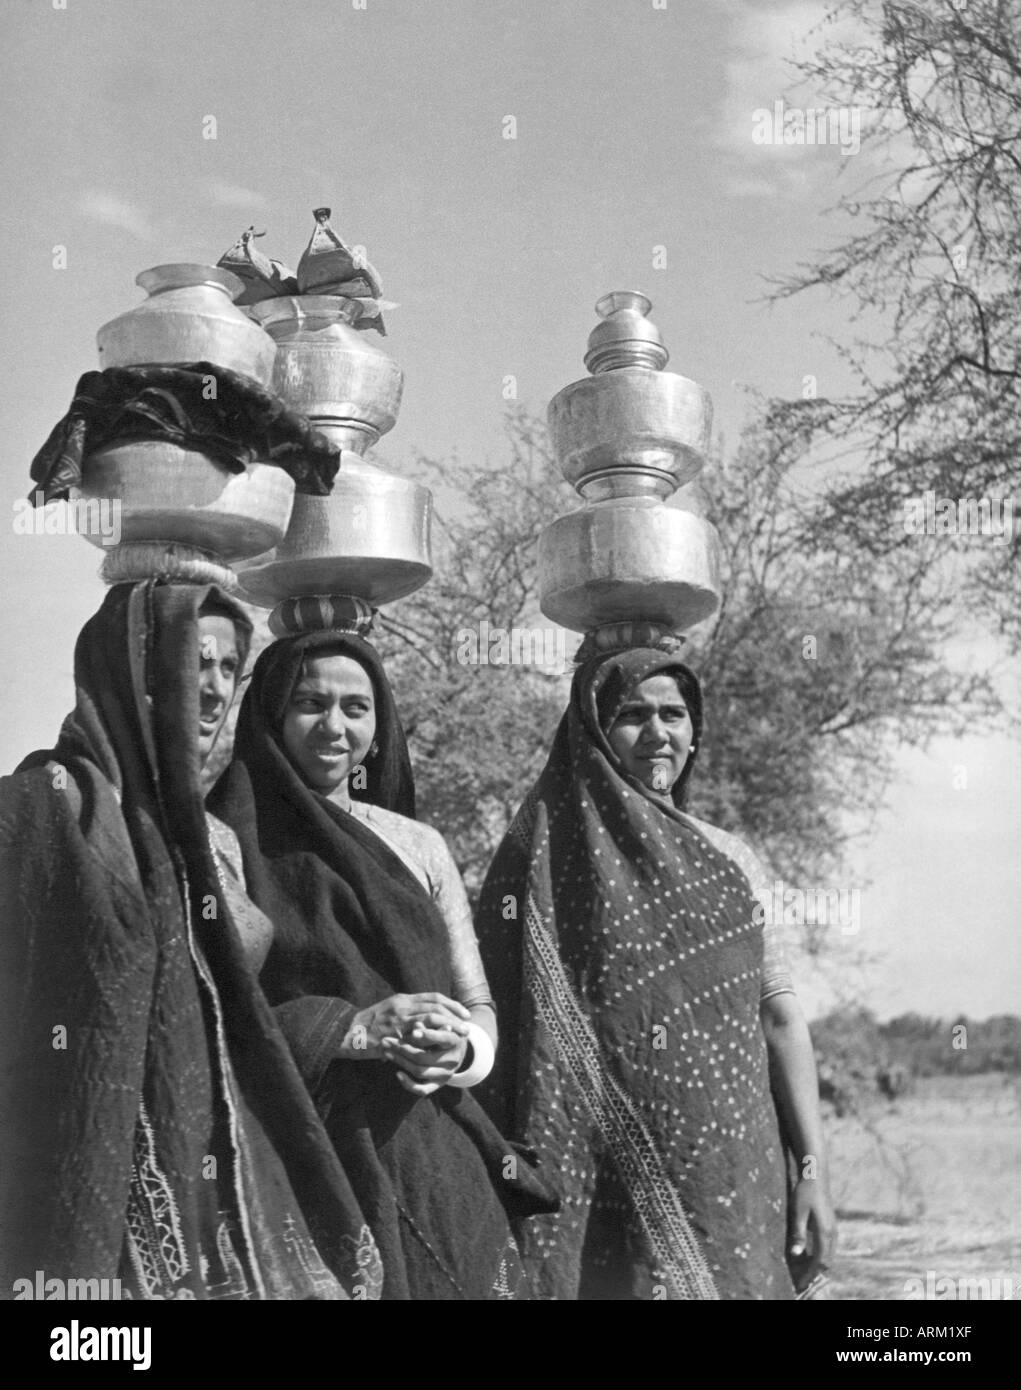 VRB101459 Indian women milk maids Ahmedabad Gujarat India 1940 s - Stock Image